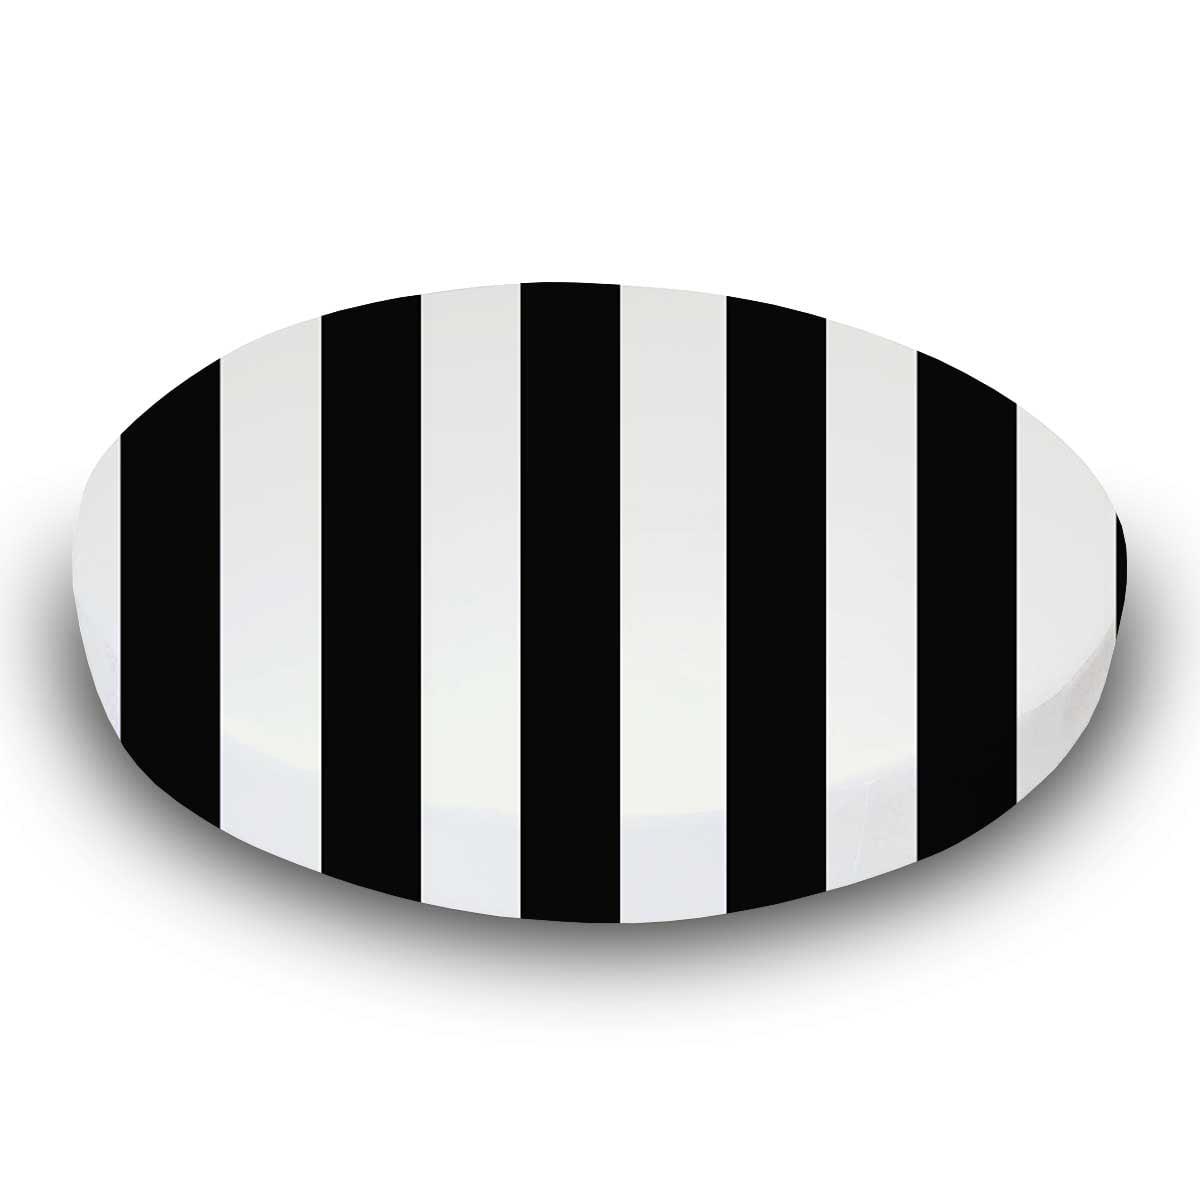 SheetWorld Fitted Oval Crib Sheet (Stokke Sleepi) - Black Stripe